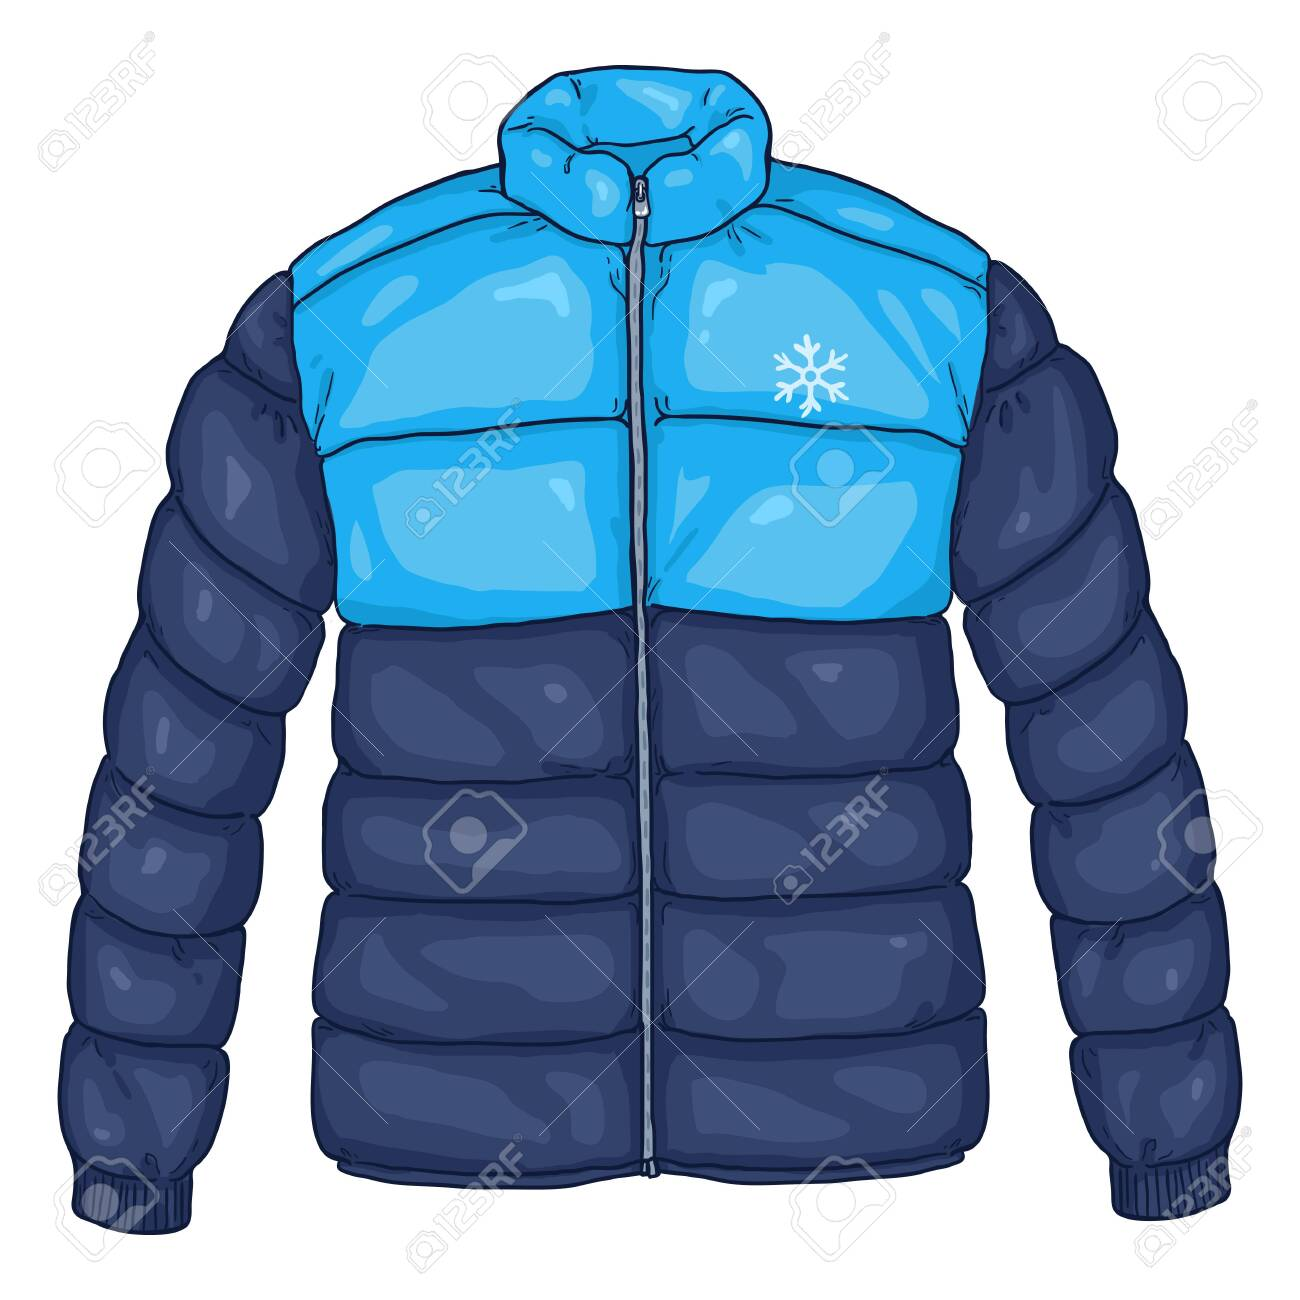 Vector Cartoon Blue Down Jacket Illustration with Snowflake Logo - 130400007